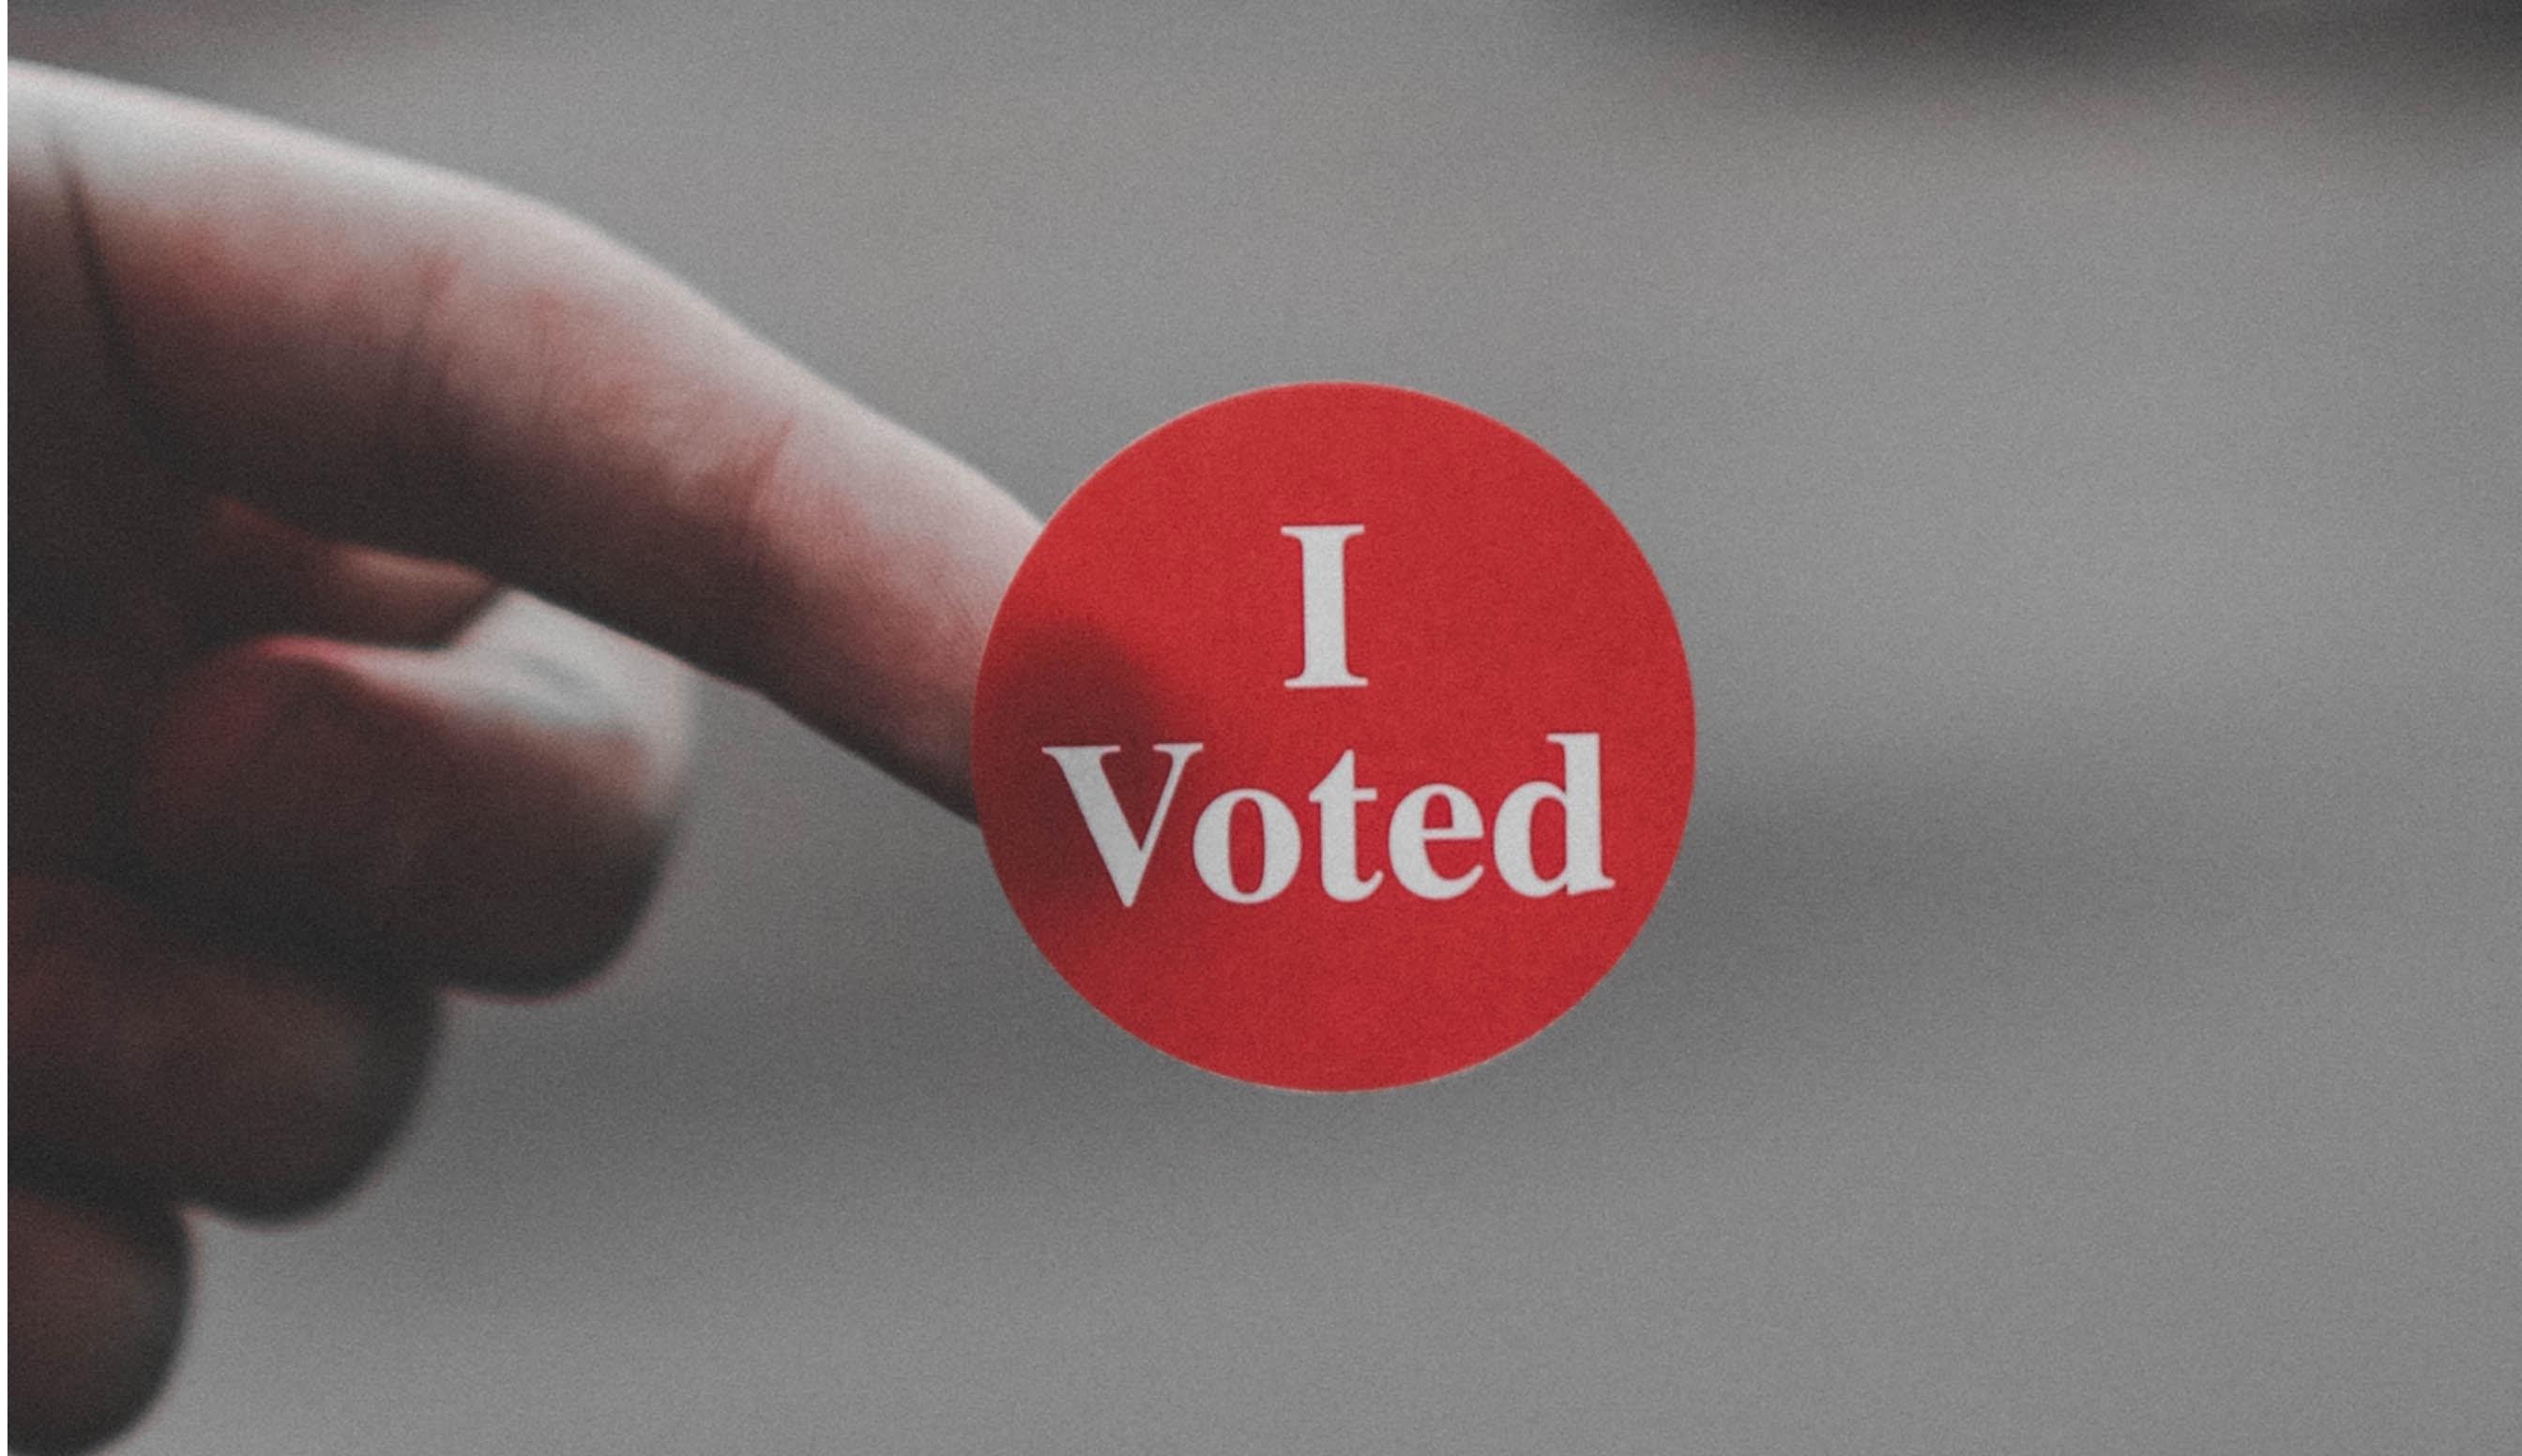 5 Simple Ways To Register To Vote